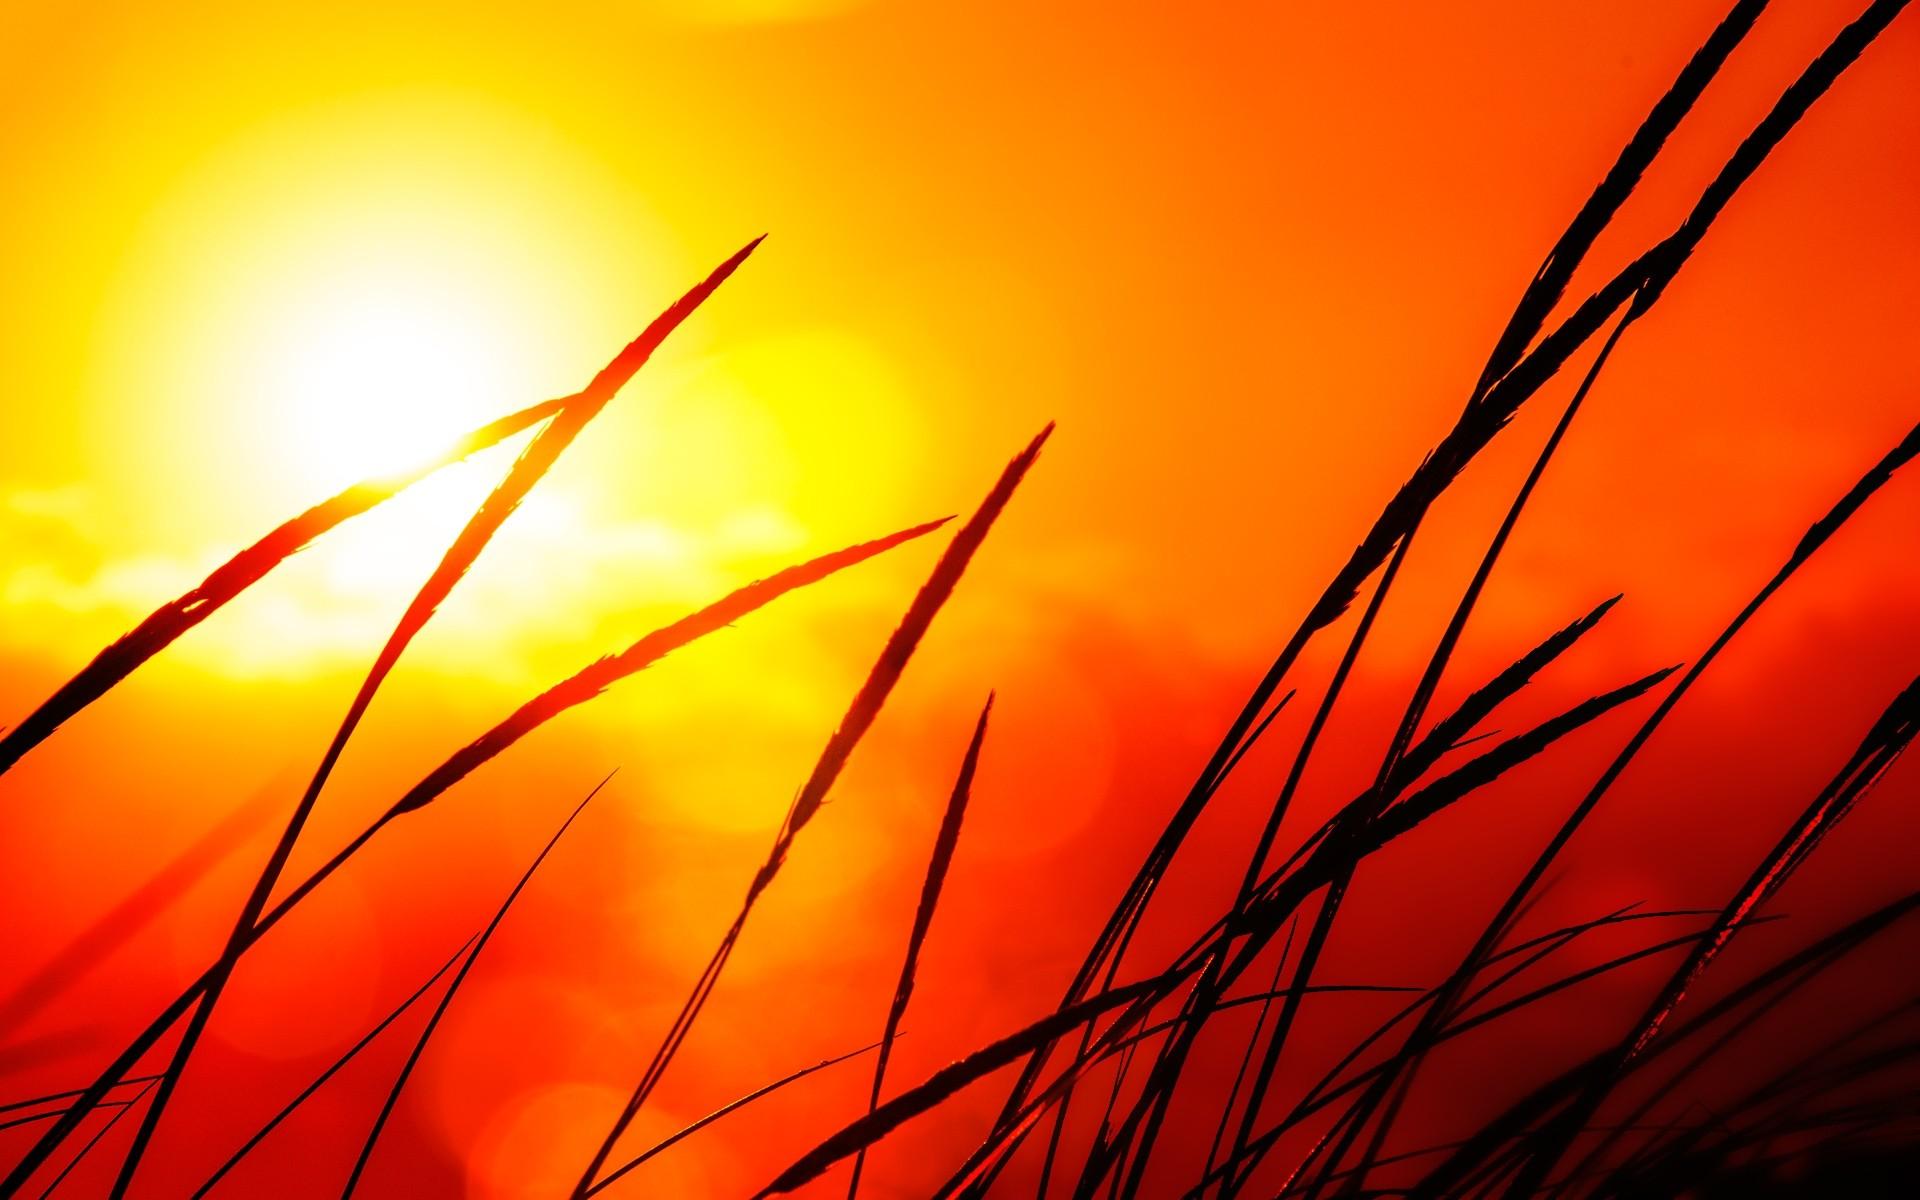 nature sun silhouettes golden plants sunlight wallpaper